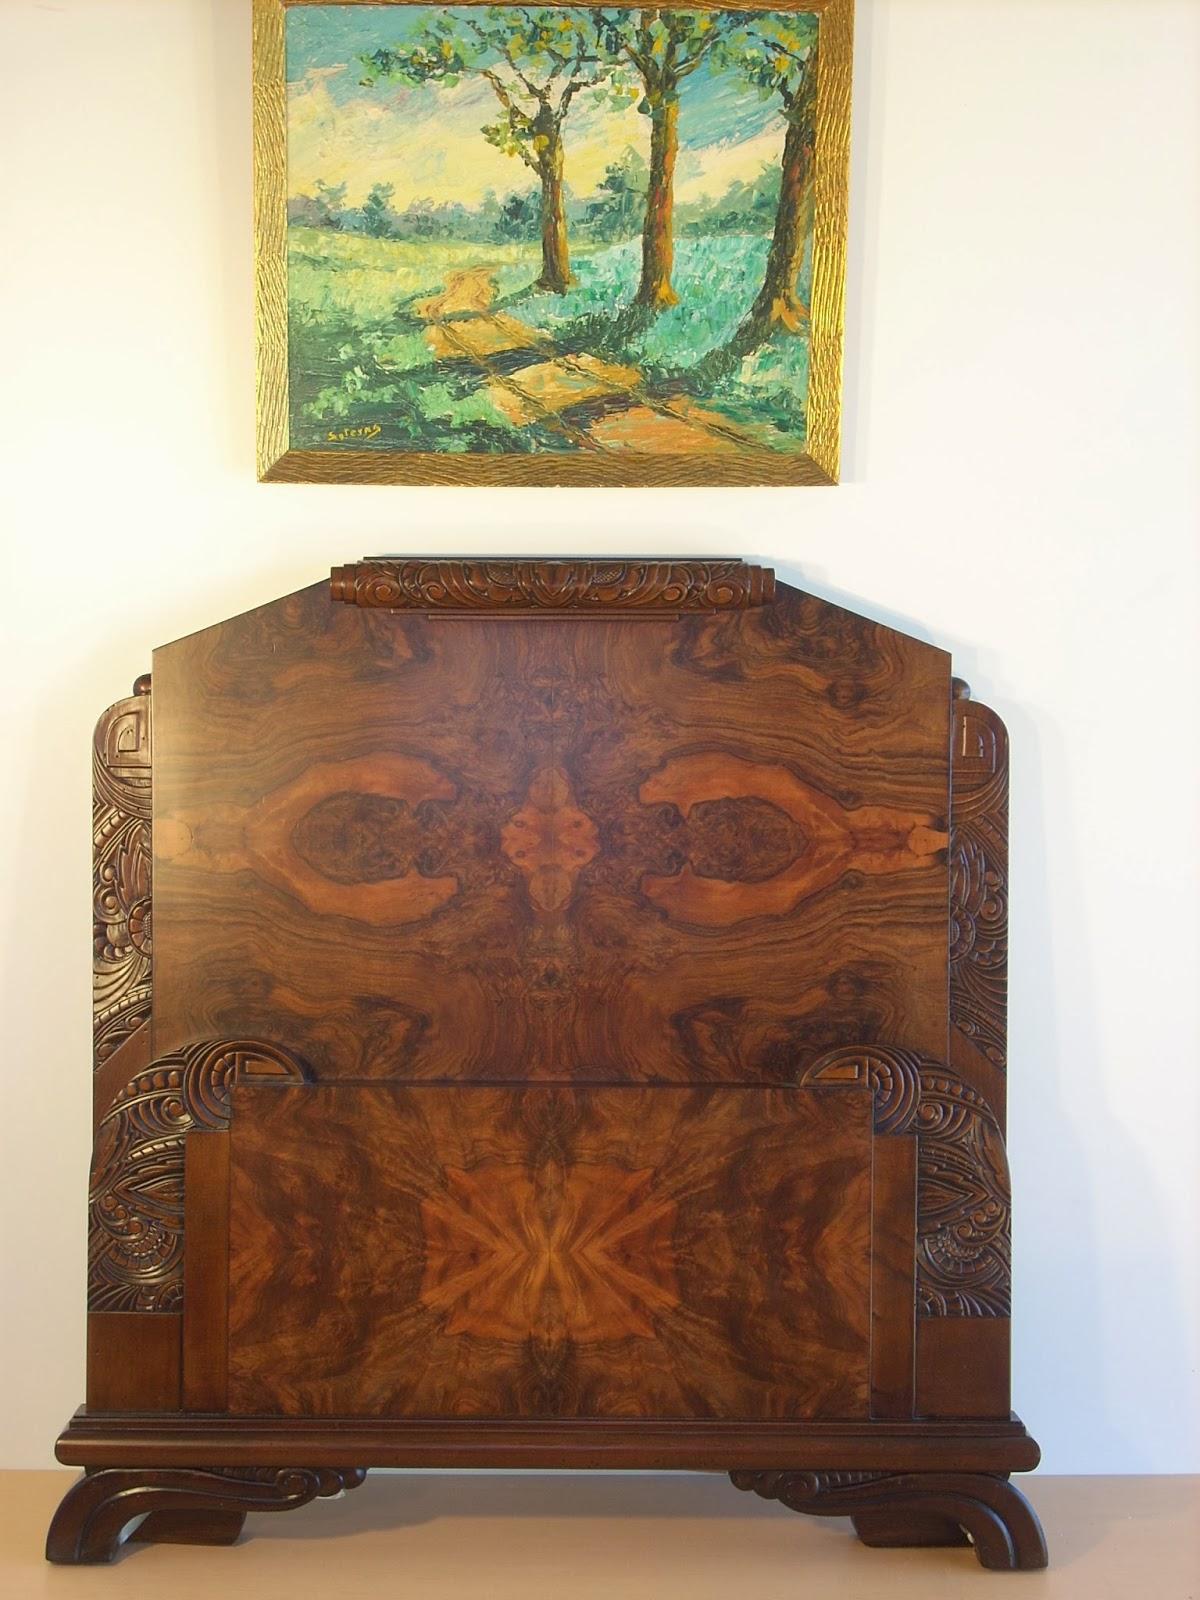 Venta de muebles antiguos restaurados naturmoble cama art - Comprar muebles antiguos ...